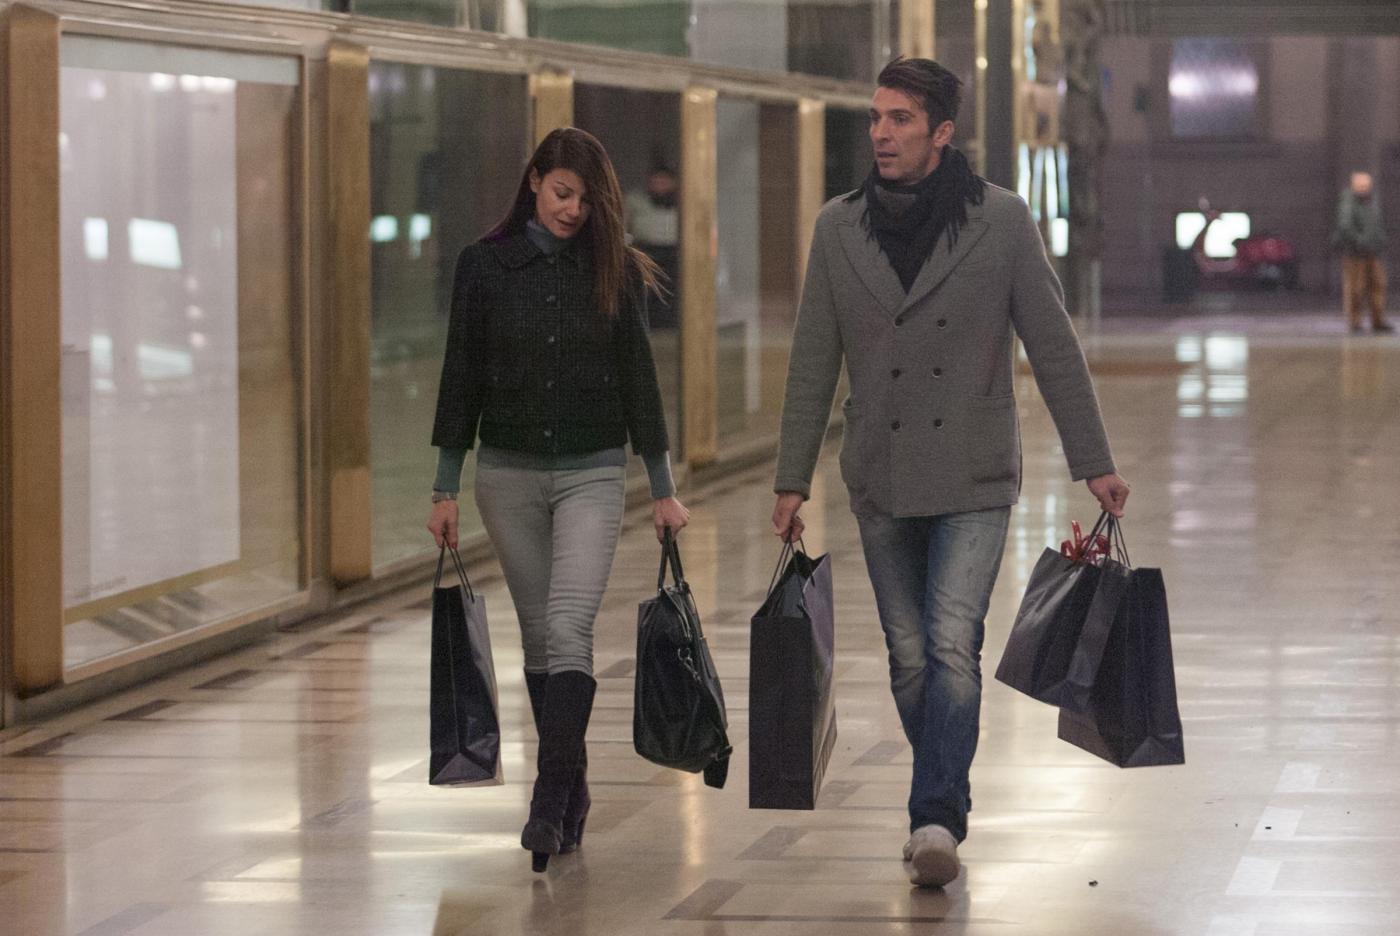 Ilaria D'Amico, Gigi Buffon: spuntino e shopping03